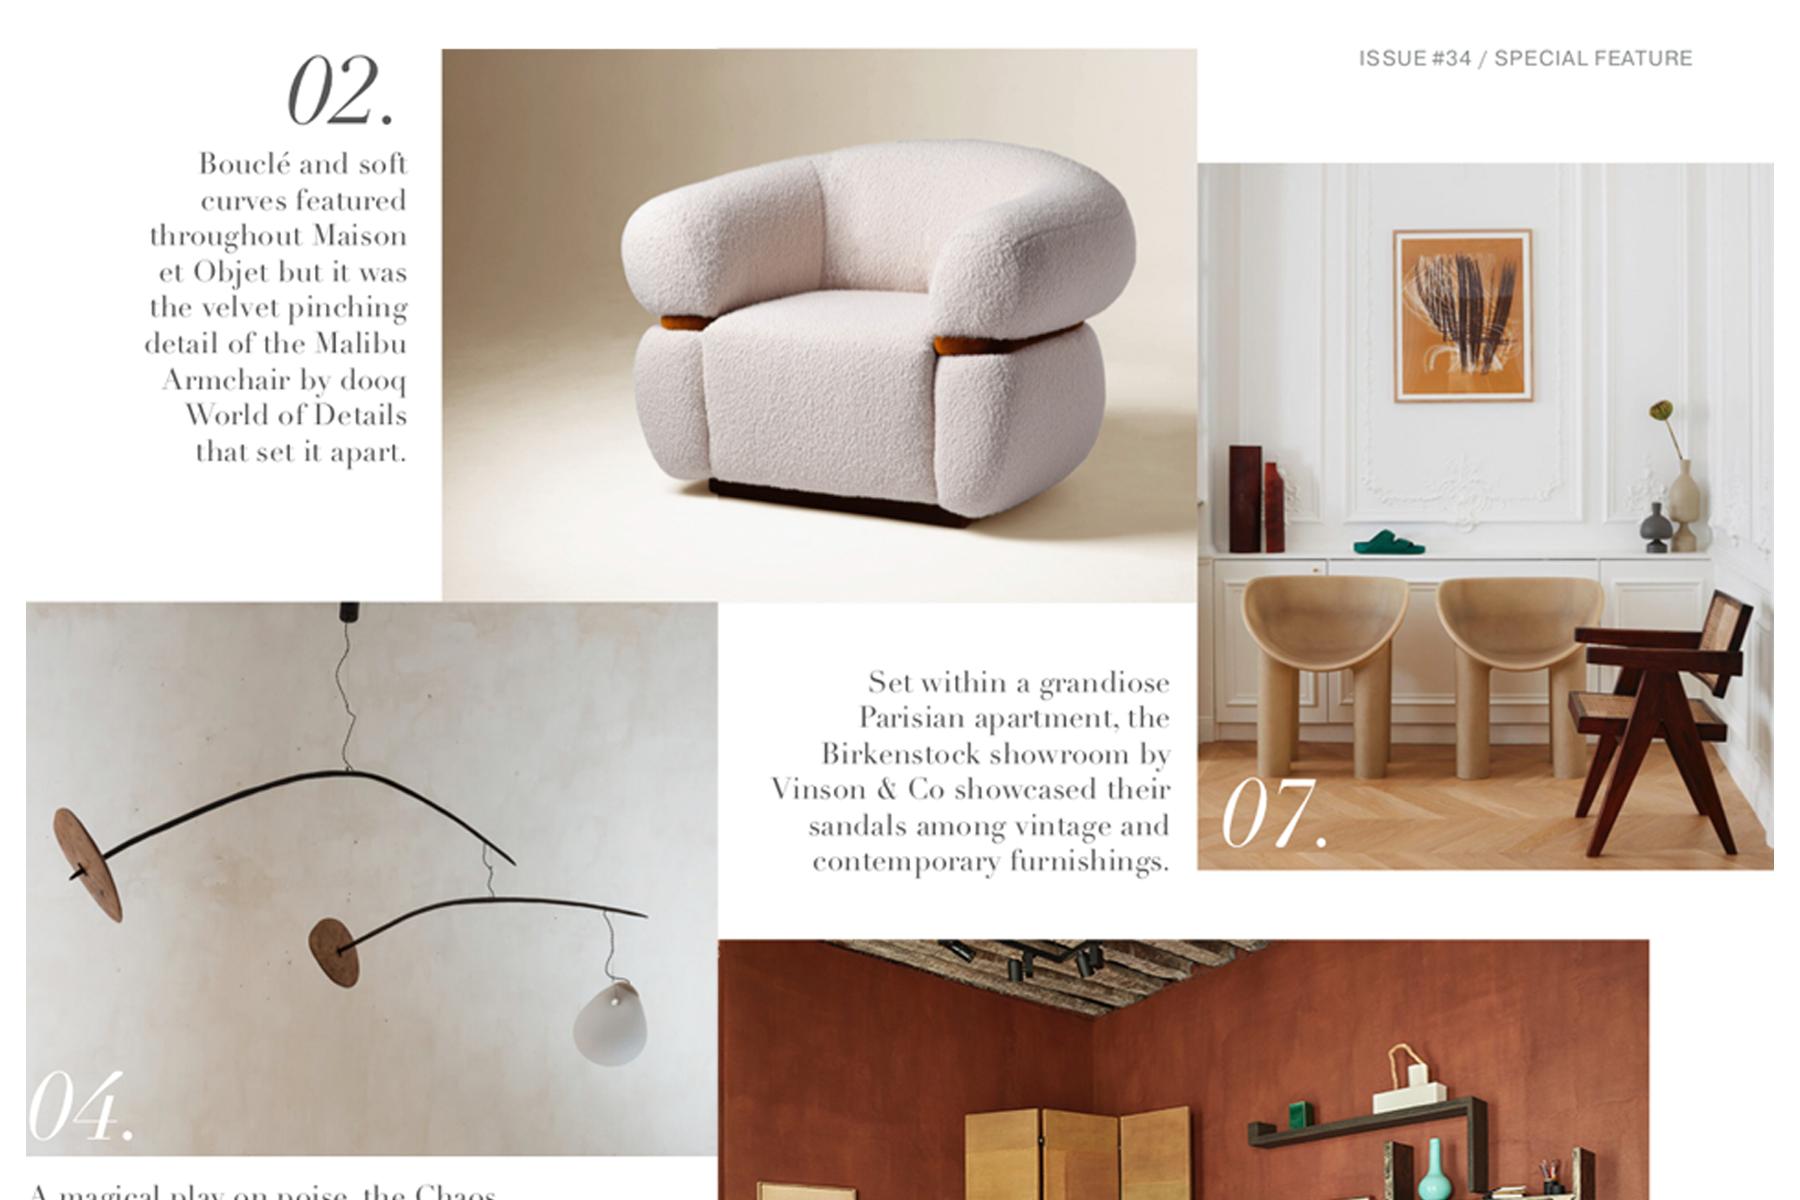 Malibu Armchair in Est Living Magazine, Paris Design Week 2019. #dooqdetails #cabniet #editorial #magazine #feature #FindItStyleIt #SMMakeLifeBeautiful #SODomino #JungalowStyle #HowIHaven #IDCOatHome  #OneRoomChallenge #CurrentDesignSituation #ApartmentTherapy #HouseEnvy #MyDomaine #InMyDomaine #LonnyLiving #DesignSponge  #FindItStyleIt #MakeTimeForDesign #HowWeDwell #CurrentDesignSituation #SimplyStyleYourSpace #VogueLiving #MySMPHome #MyOKLStyle #InspoToYourHome #Interior_and_Living